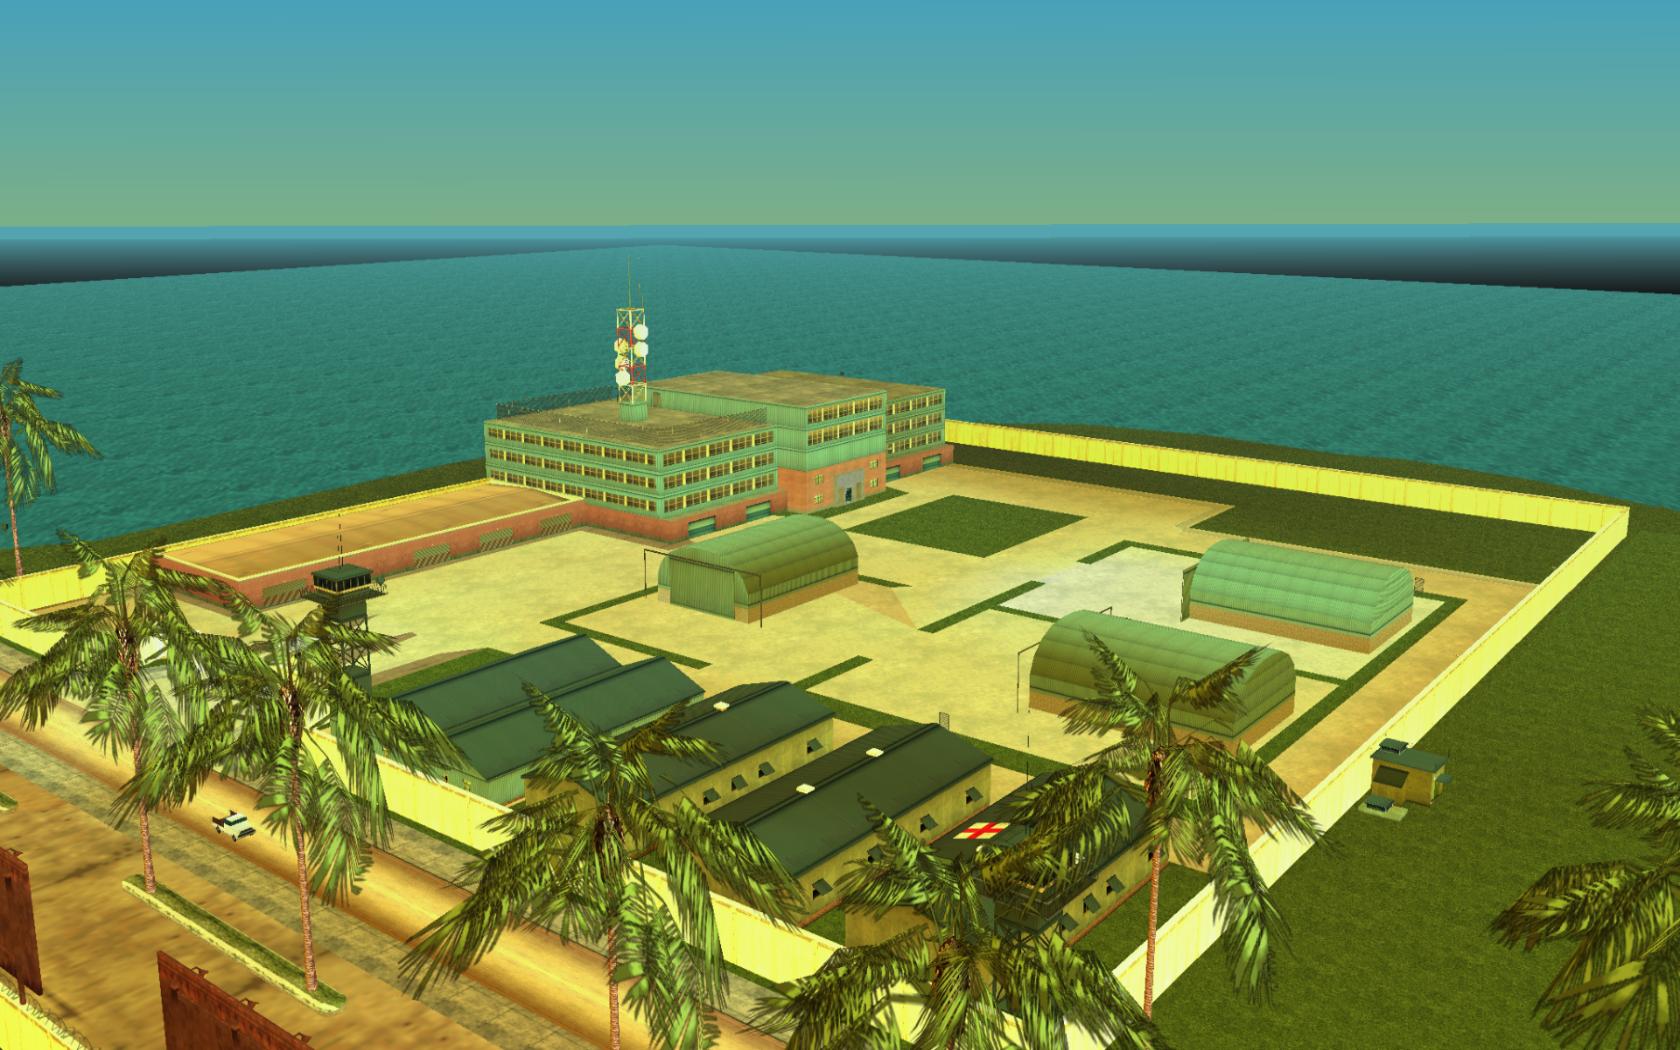 Fort Baxter Air Base